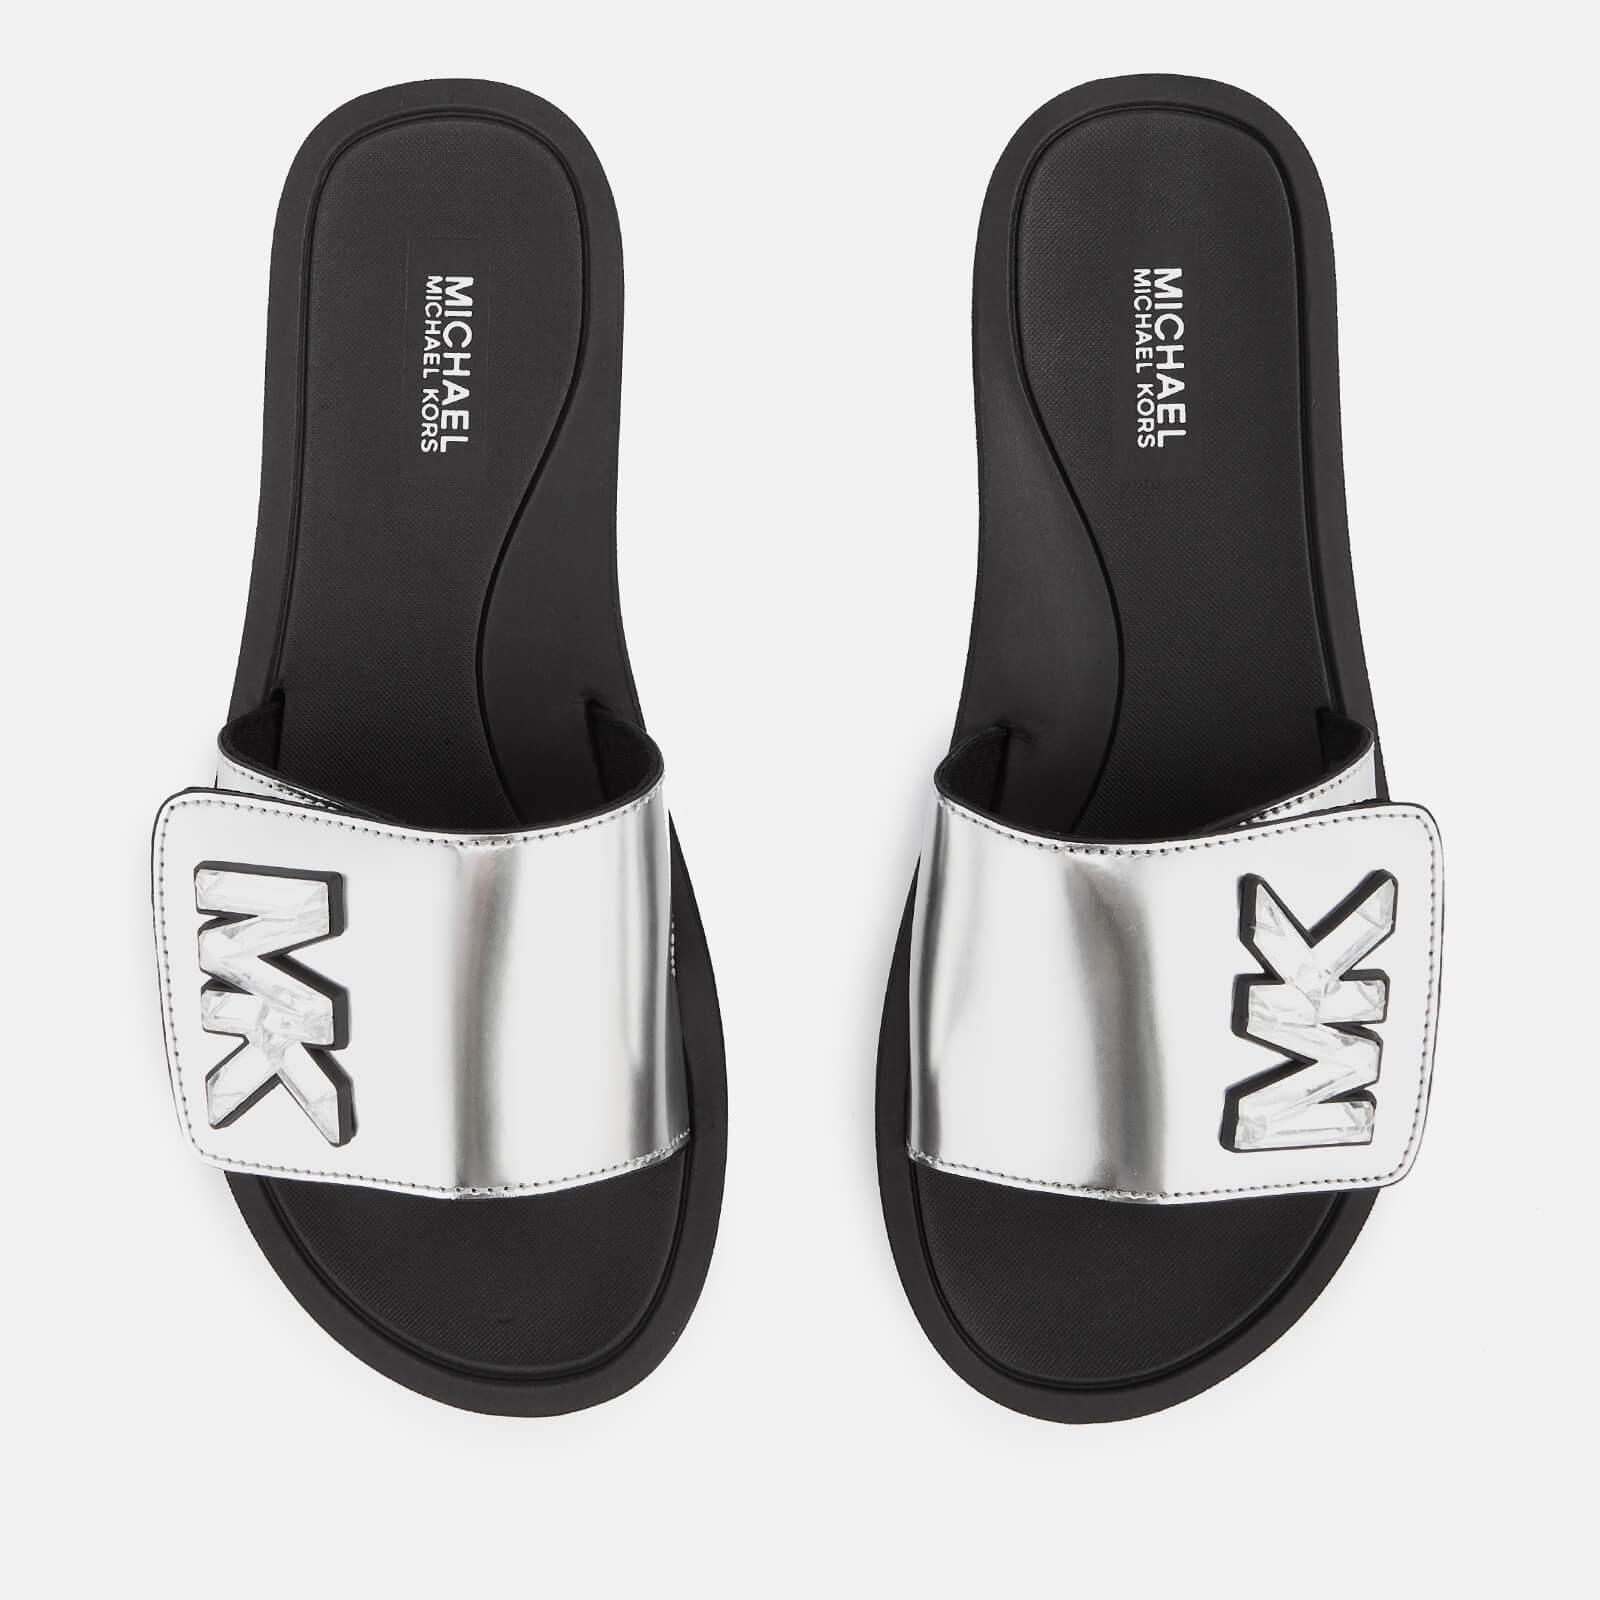 MICHAEL MICHAEL KORS Women's MK Slide Sandals - Silver - UK 3/US 6 - Silver